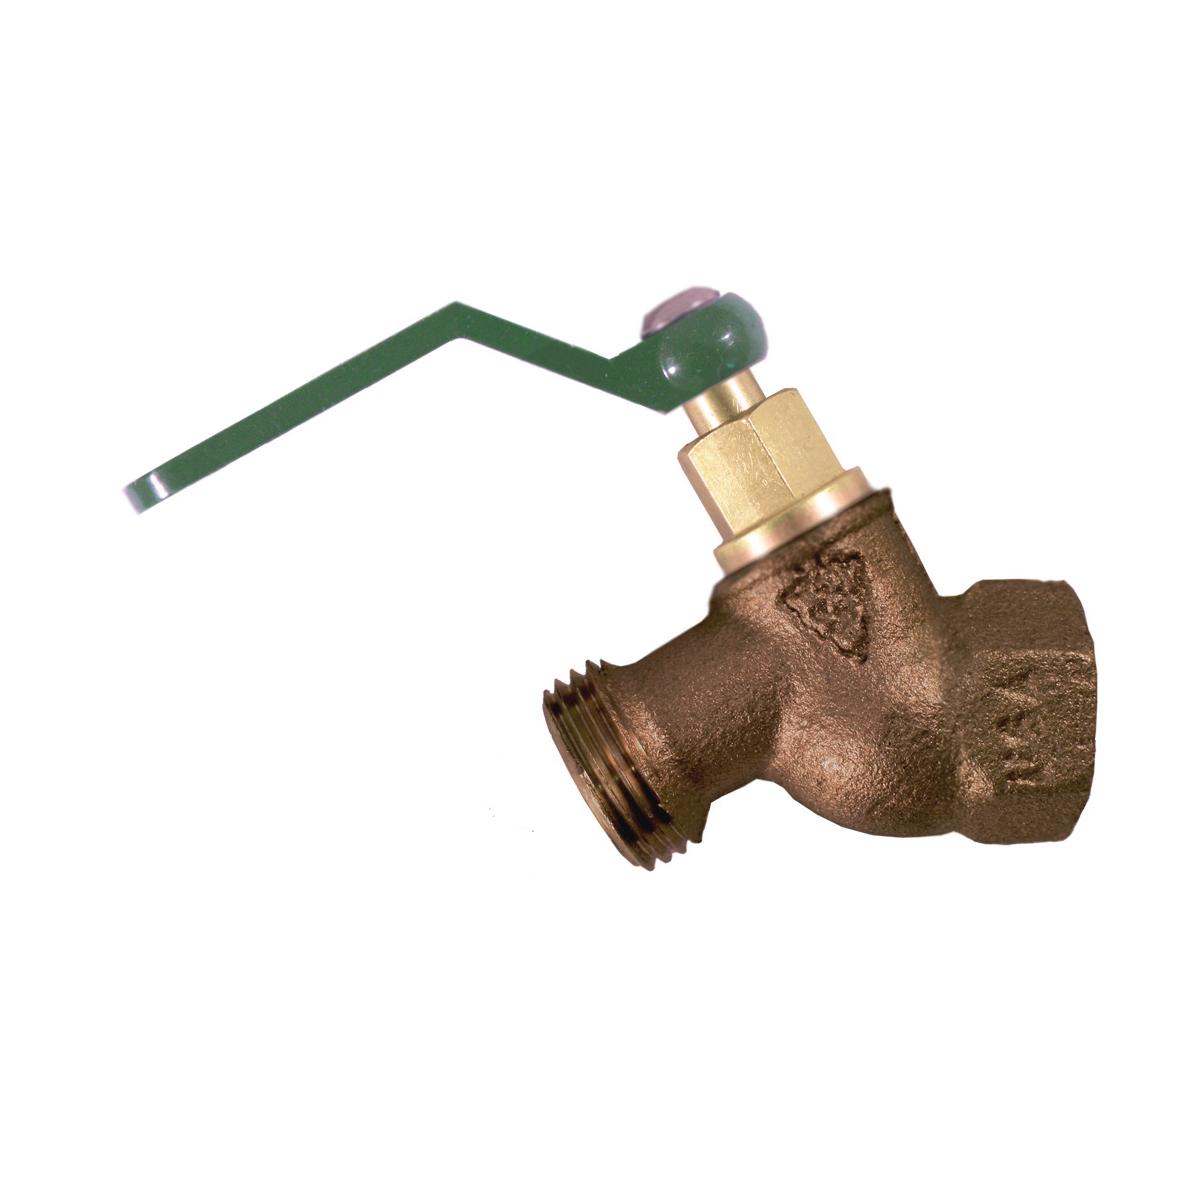 Arrowhead Brass 353QTLF No-Kink Hose Bib, 3/4 in, FNPT x Male Hose Thread, Bronze Alloy, Domestic